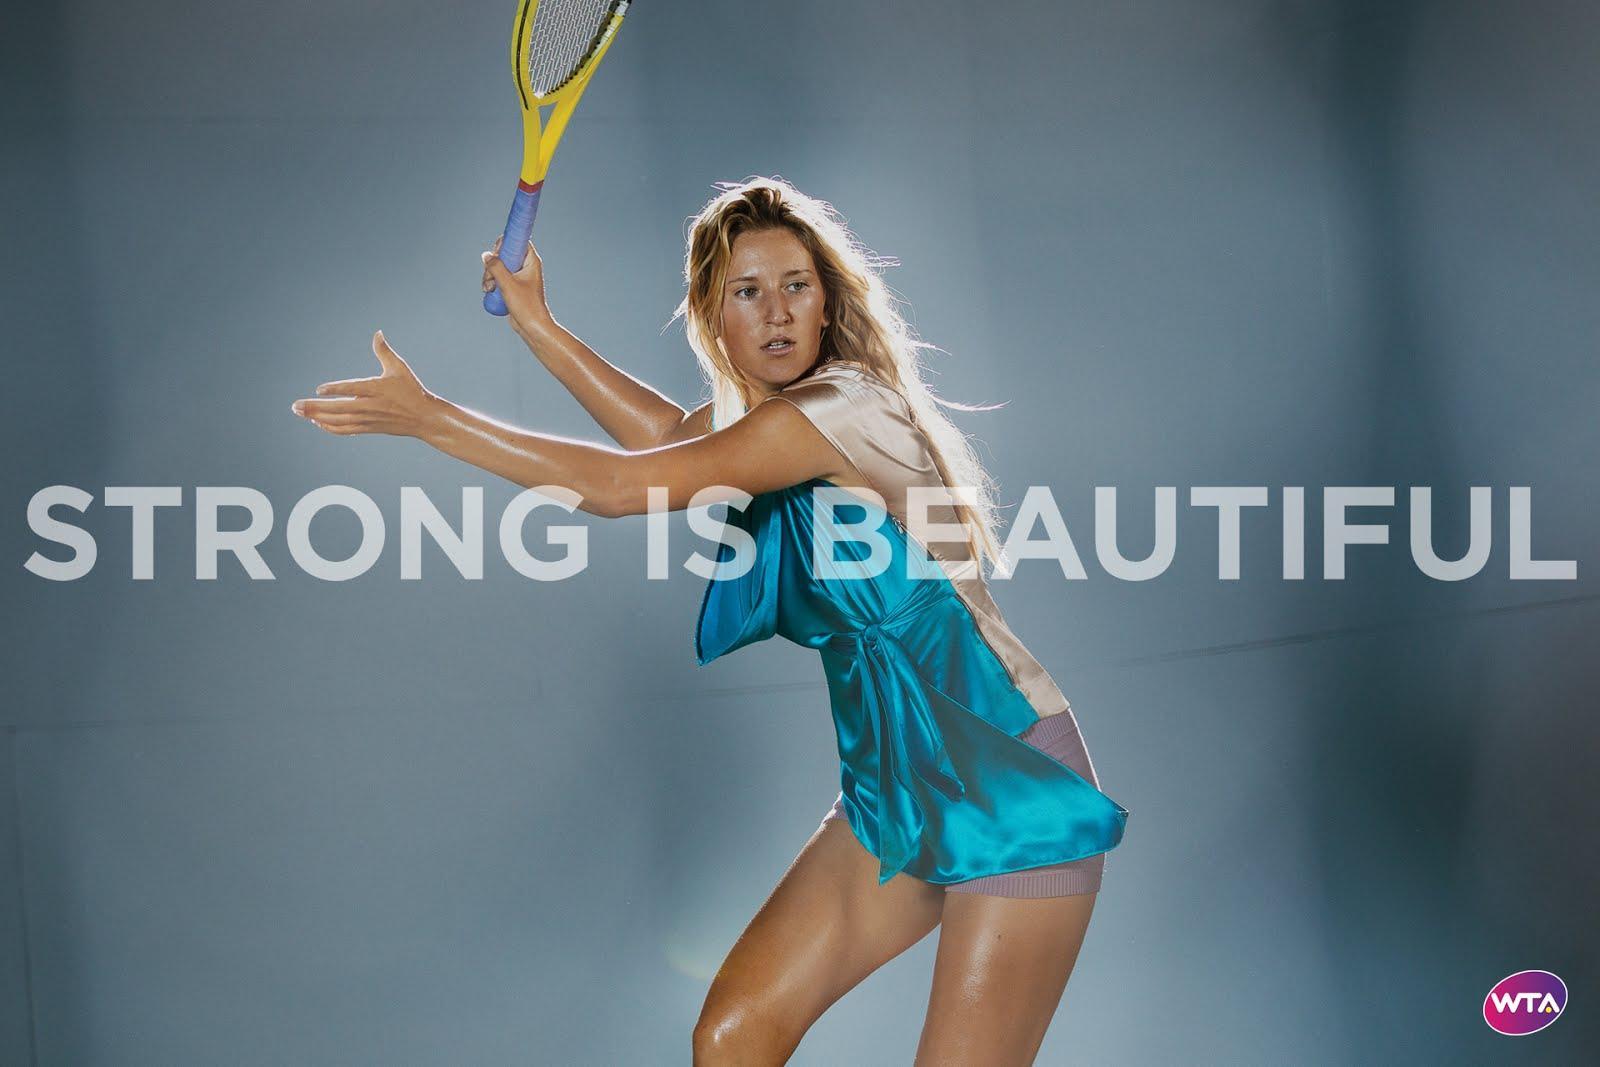 Dewey Nicks -WTA 001 - Victoria Azarenka